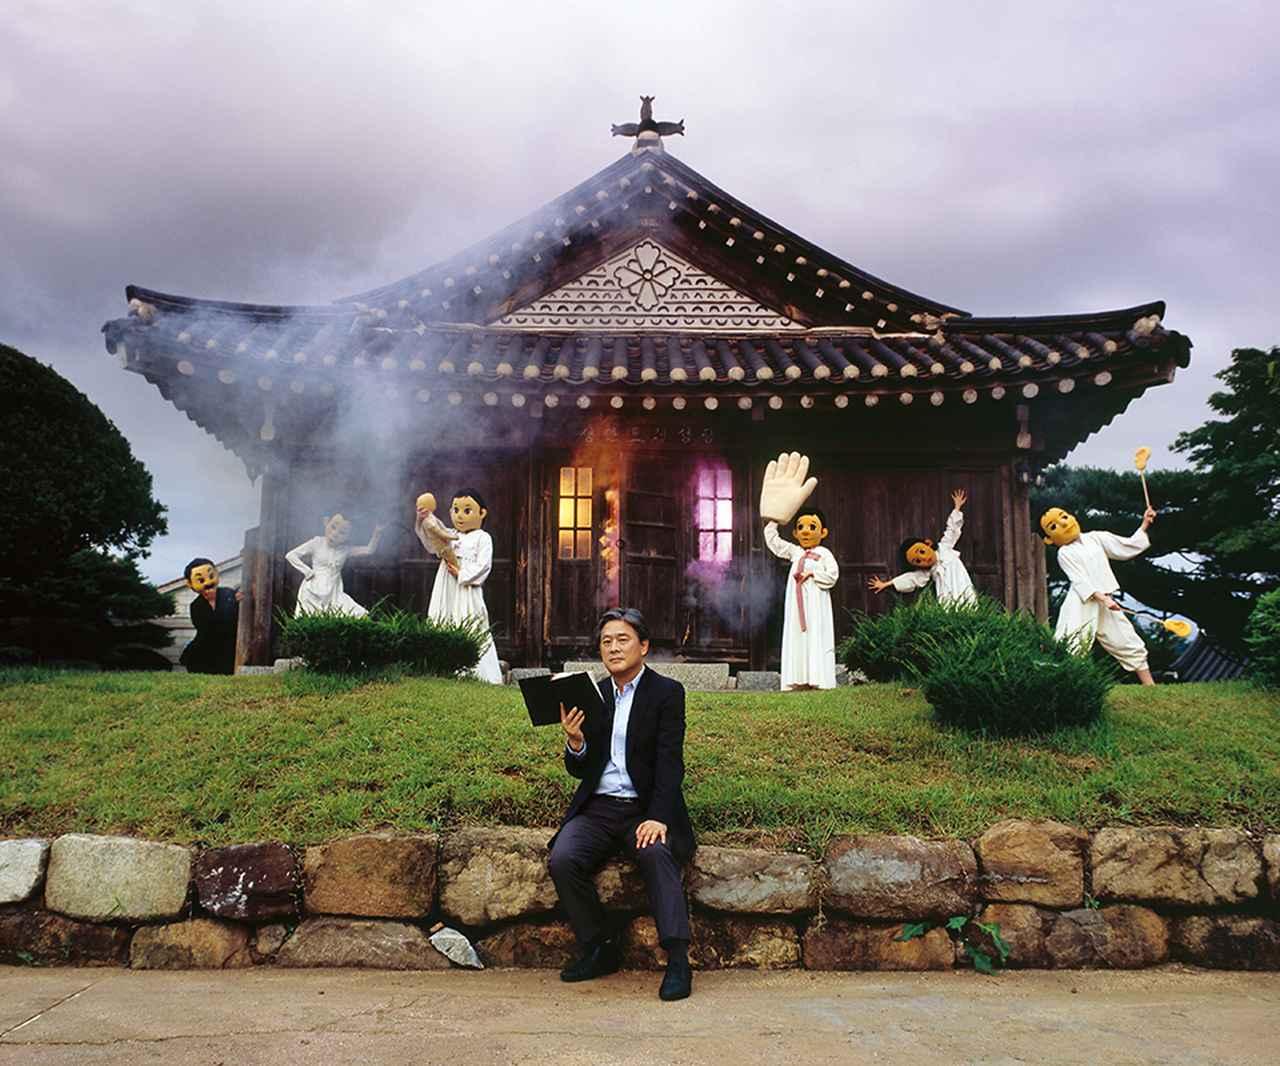 Images : 3番目の画像 - 「復讐映画の巨匠、パク・チャヌク その知られざる素顔<後編>」のアルバム - T JAPAN:The New York Times Style Magazine 公式サイト